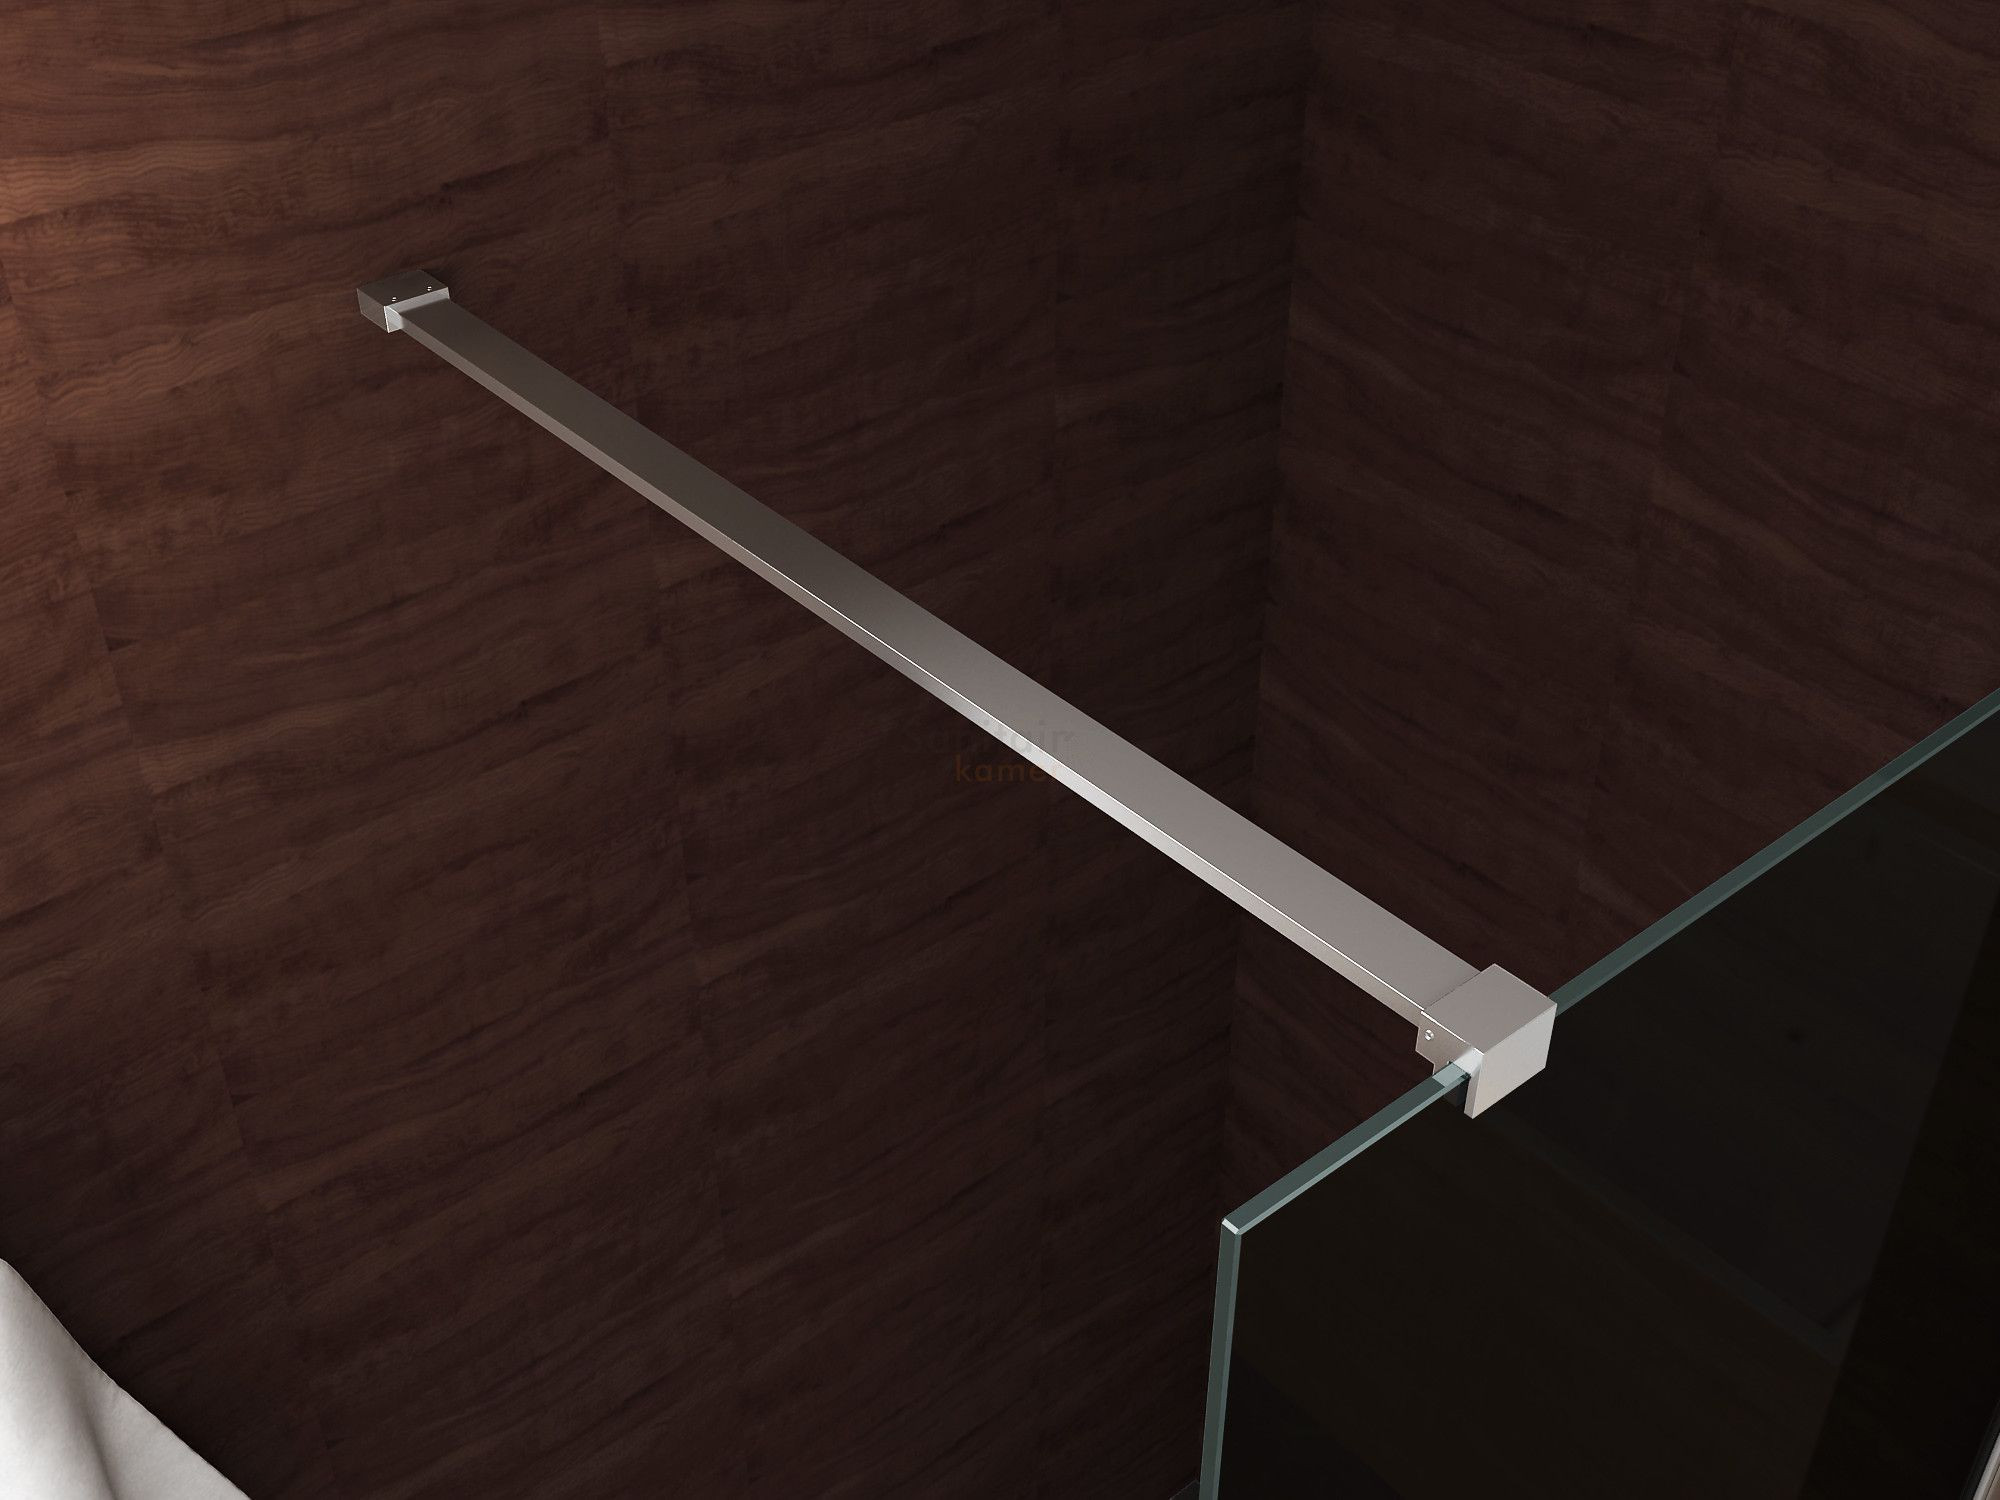 https://www.tegelensanitairmagazijn.nl/46613/aktie-douchewand-rookglas-goedkoop-bathxe-10-mm-nano-alle-maten.jpg